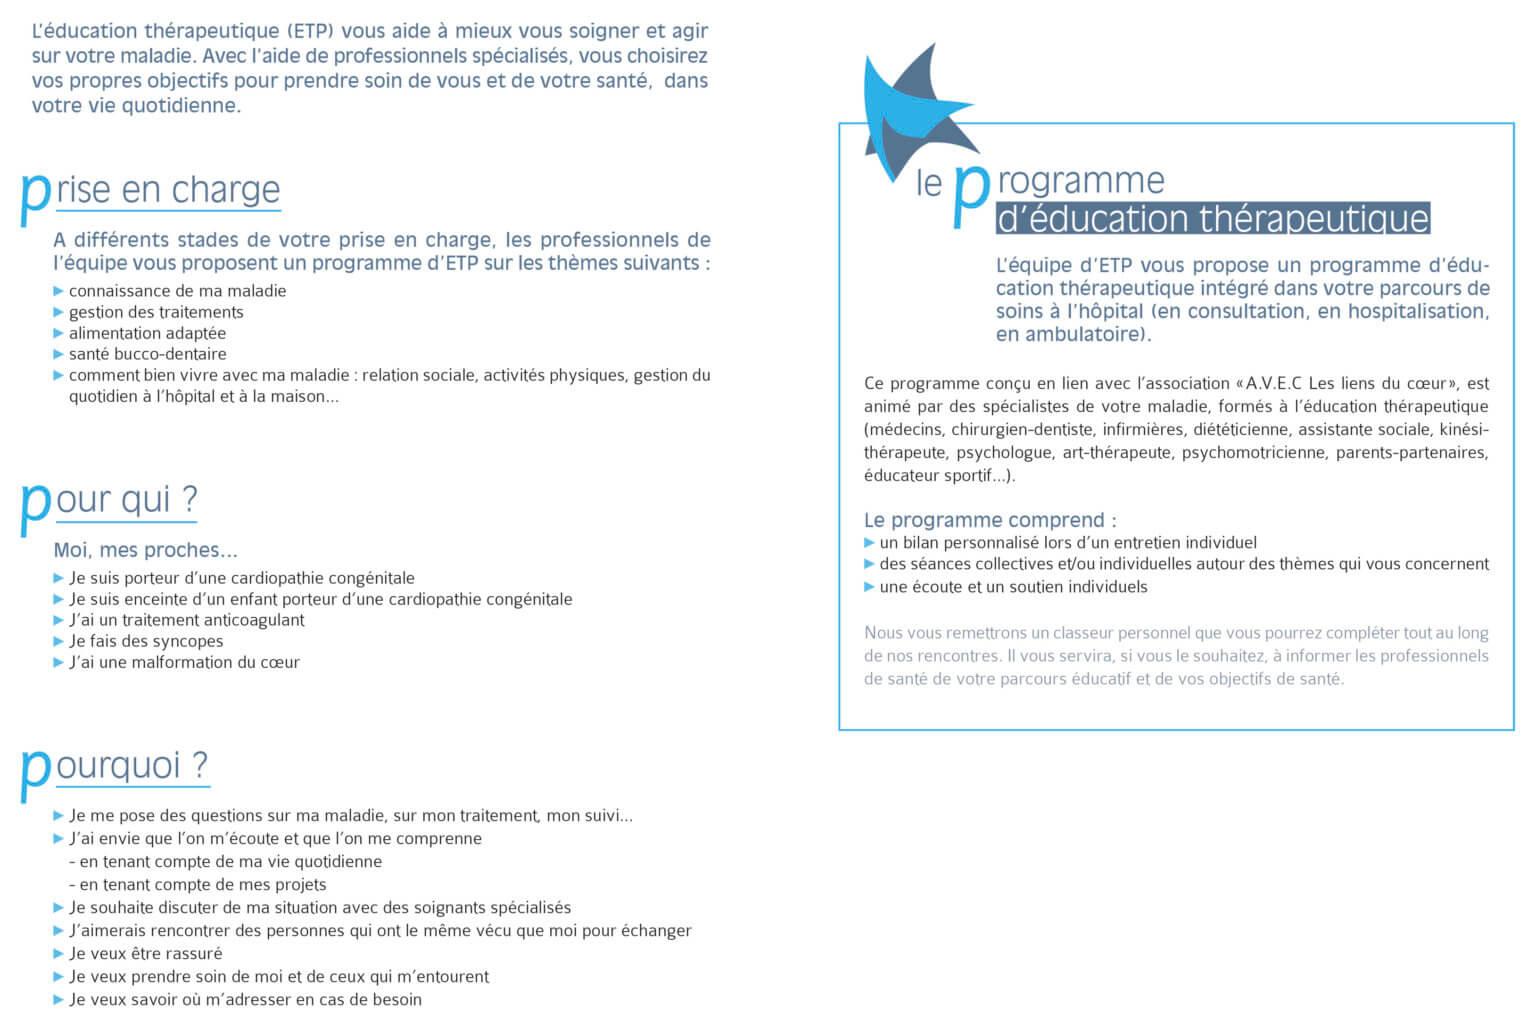 education therapeutique 2